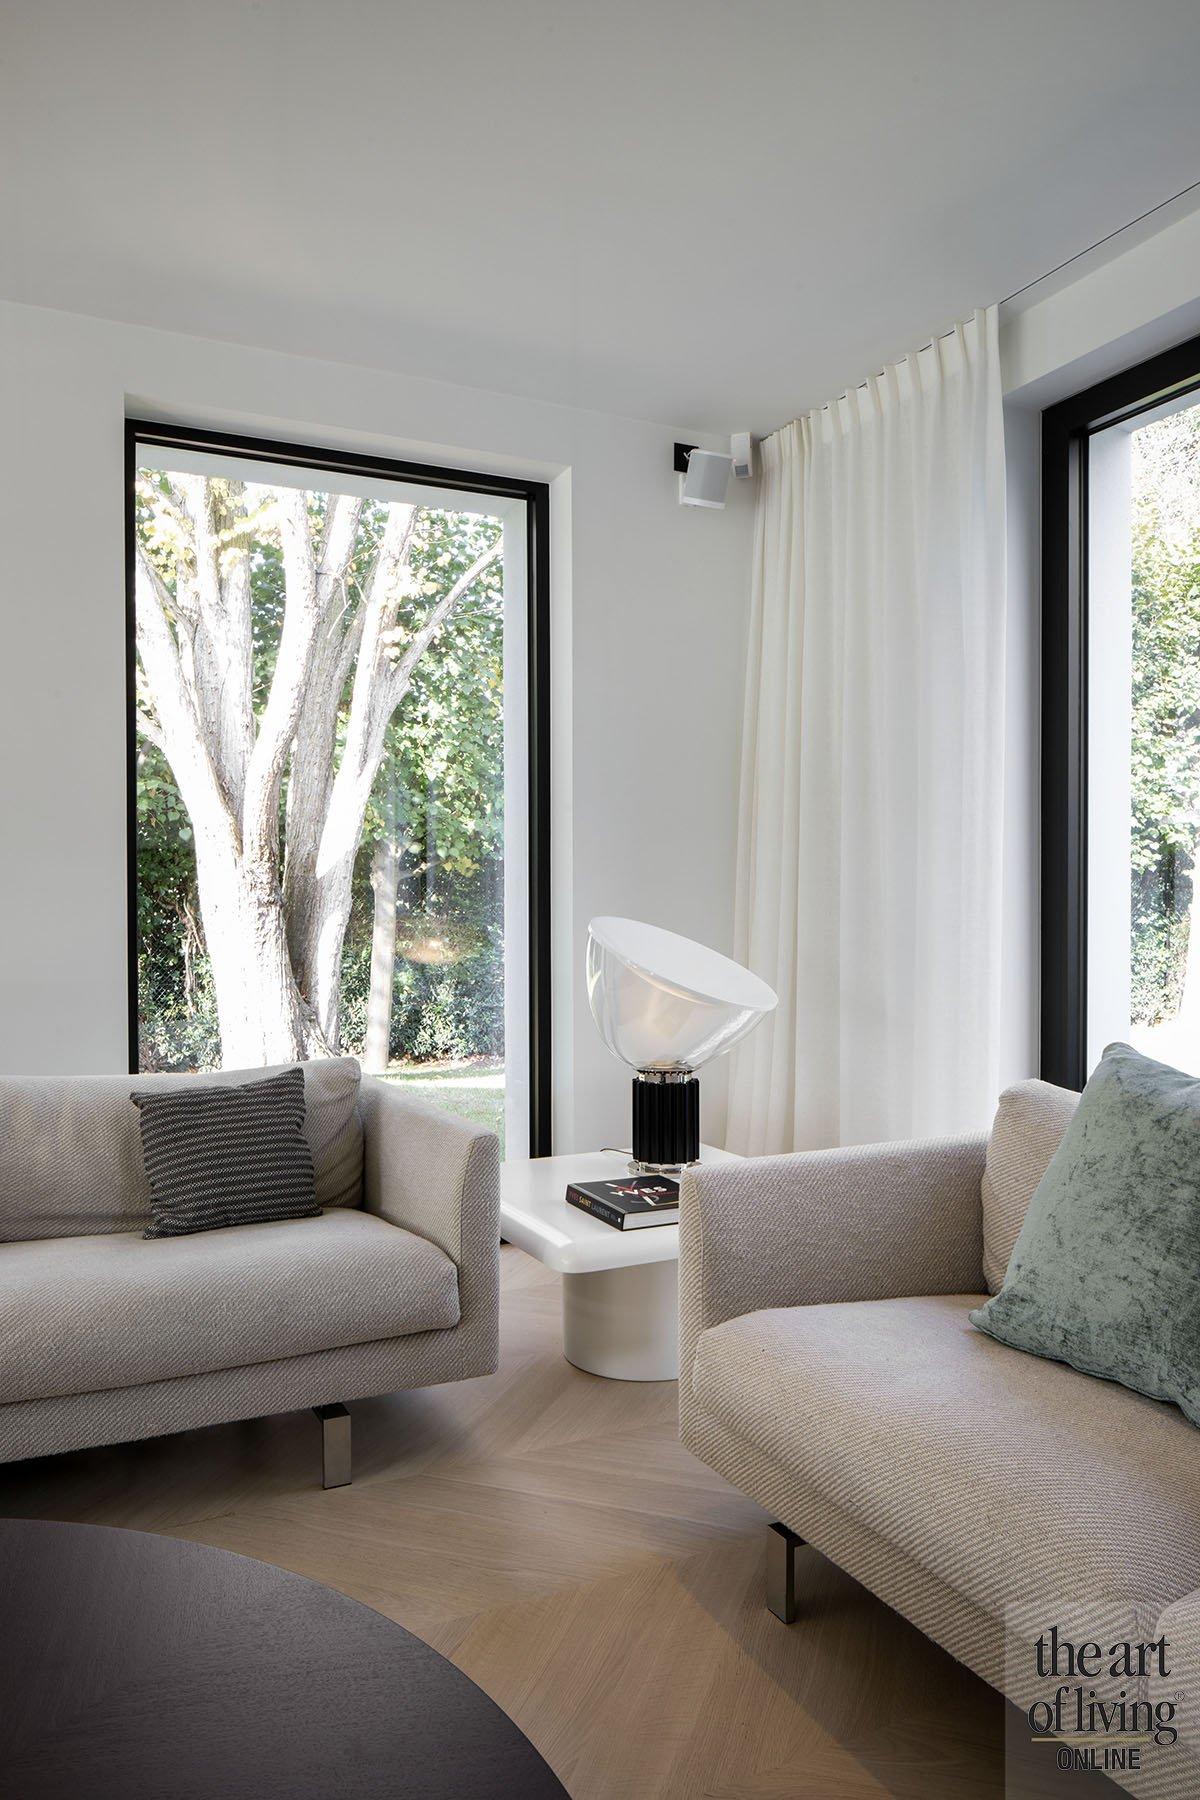 Modern interieur, Buro2018, the art of living